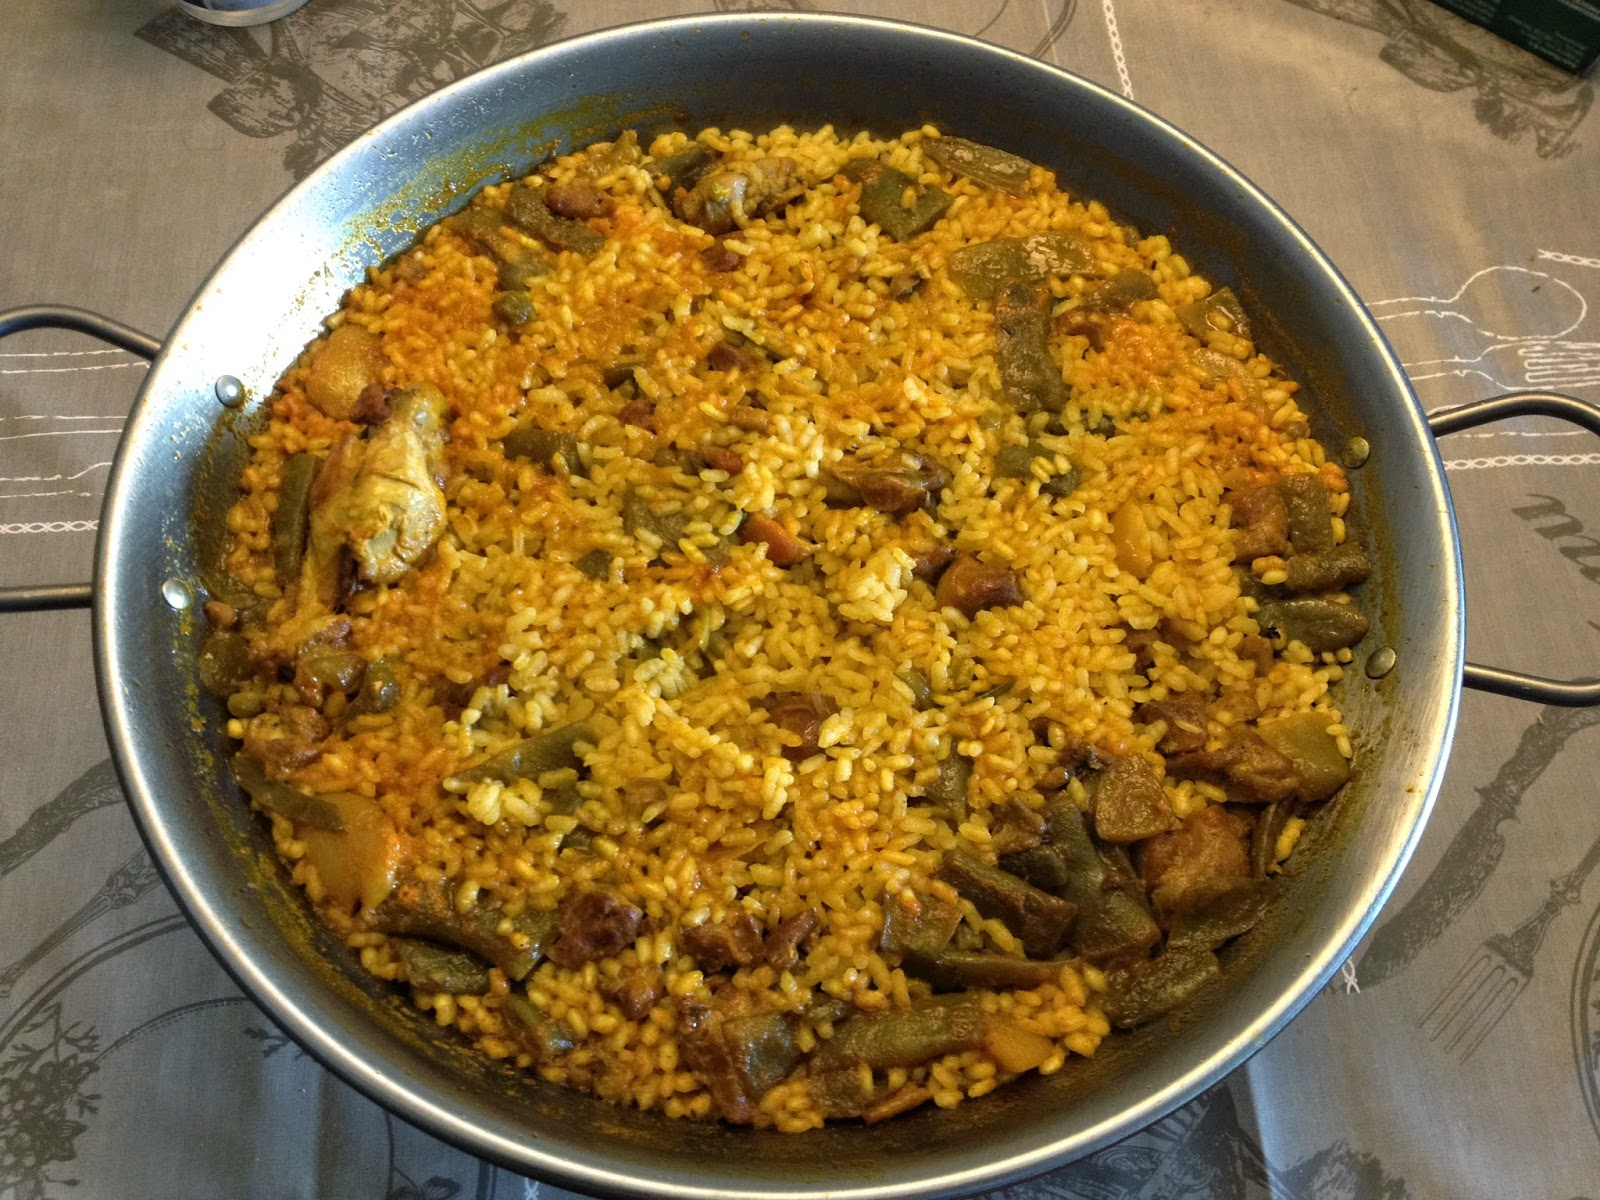 Can joan i sara productos gastraval kit barbacoa paella valenciana y paella marinera - Cocina con sara paella ...